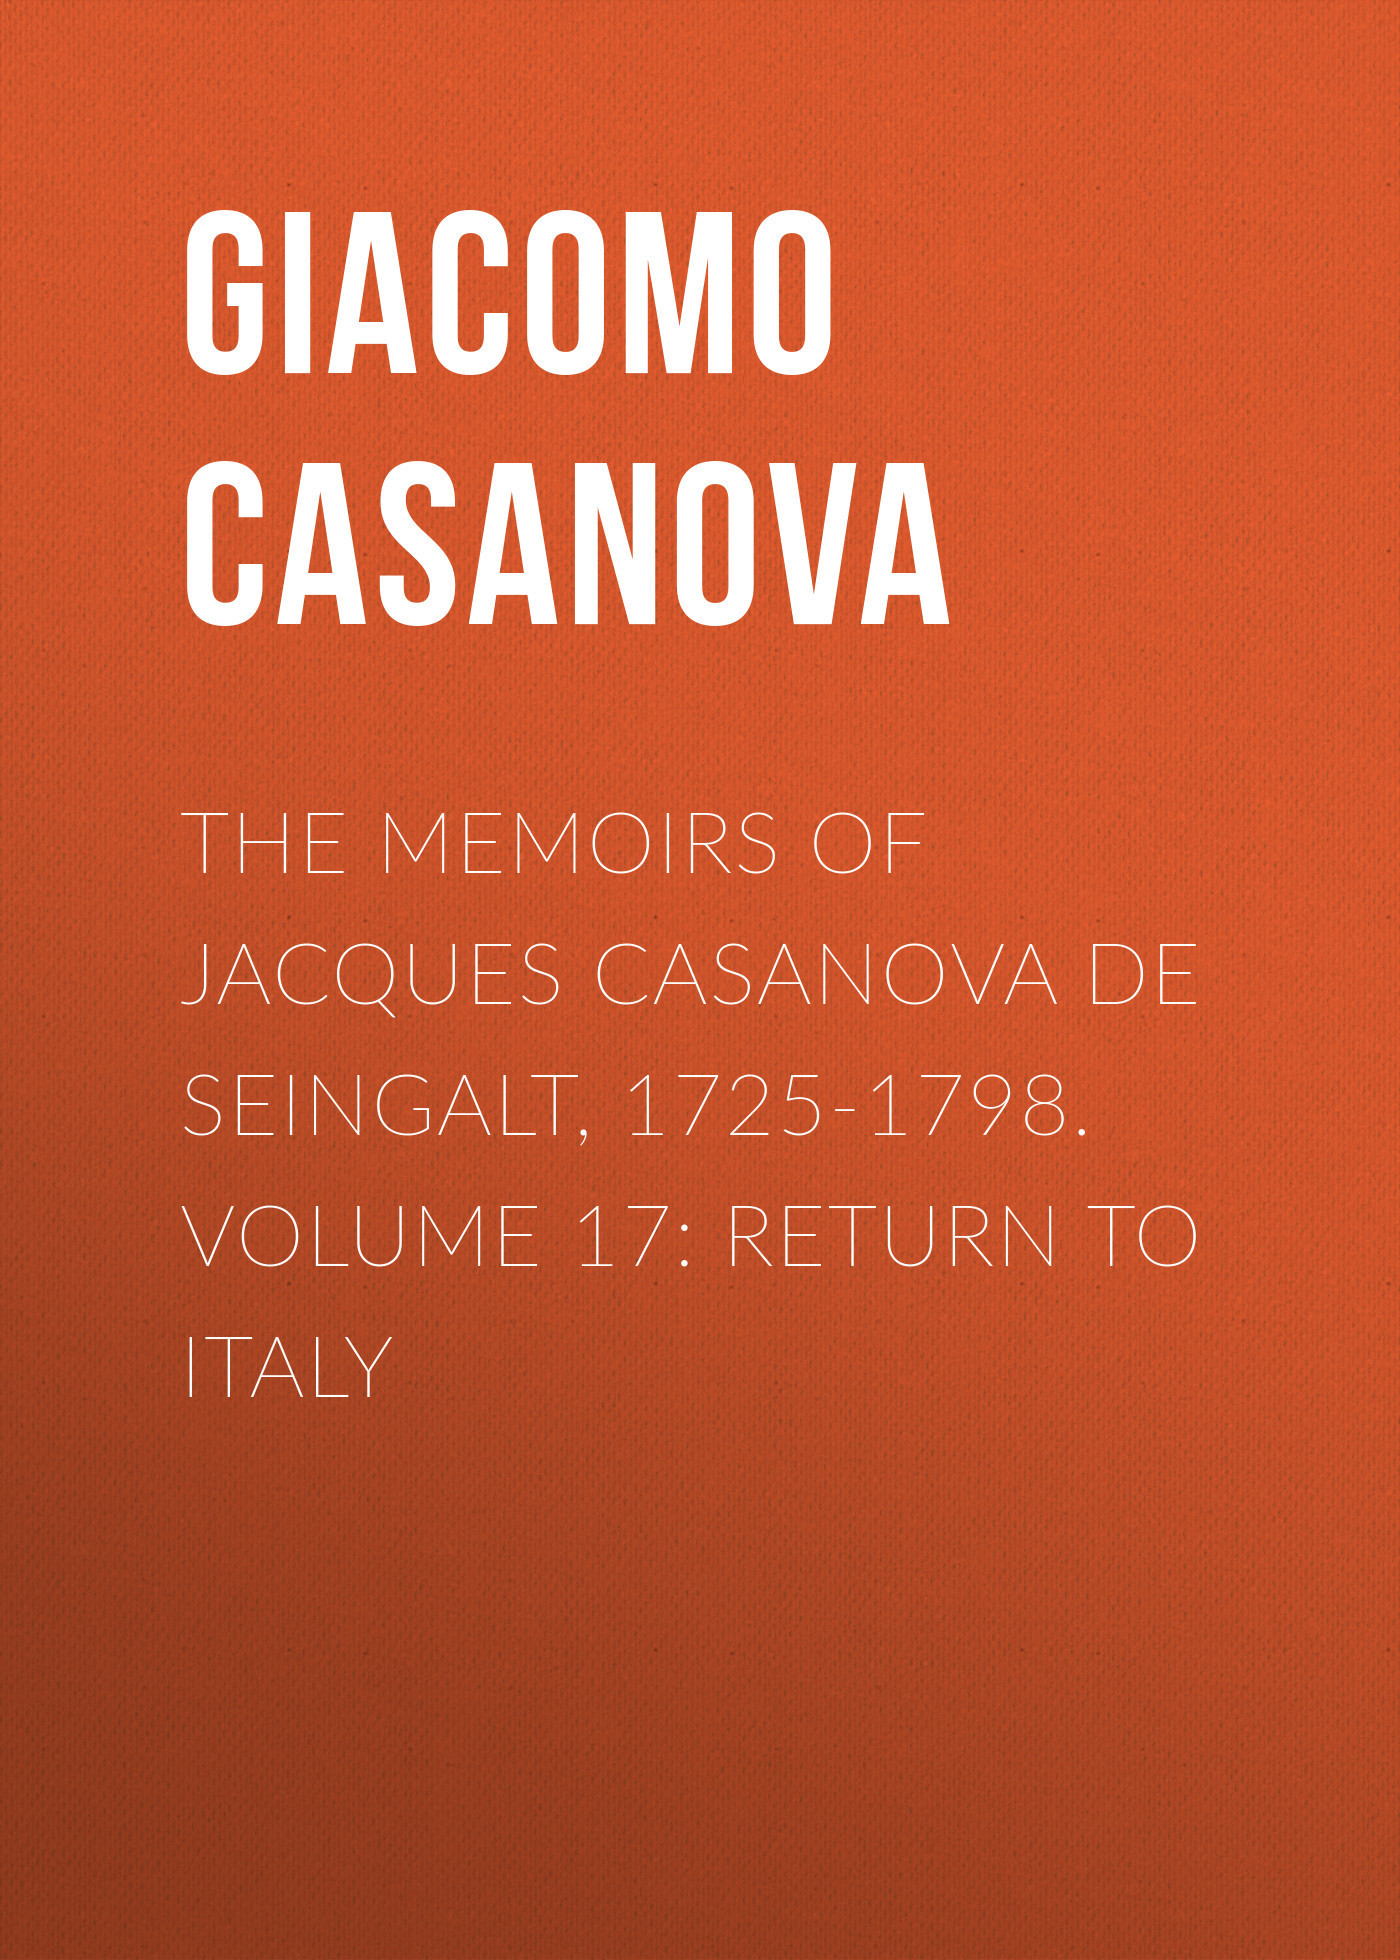 Giacomo Casanova The Memoirs of Jacques Casanova de Seingalt, 1725-1798. Volume 17: Return to Italy giacomo casanova the memoirs of jacques casanova de seingalt 1725 1798 volume 17 return to italy